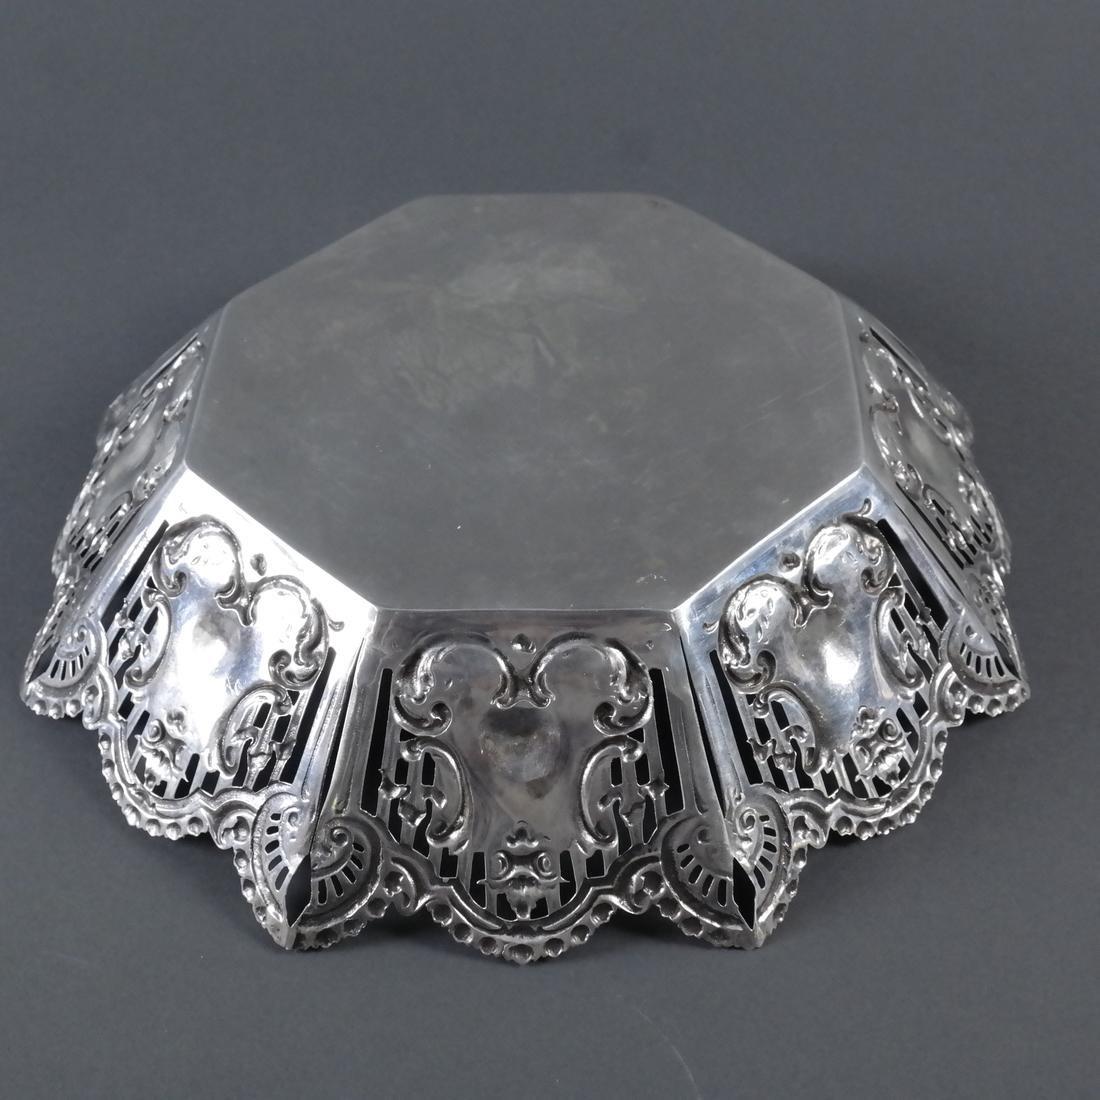 .900 Standard Silver Ornate Centerpiece - 6